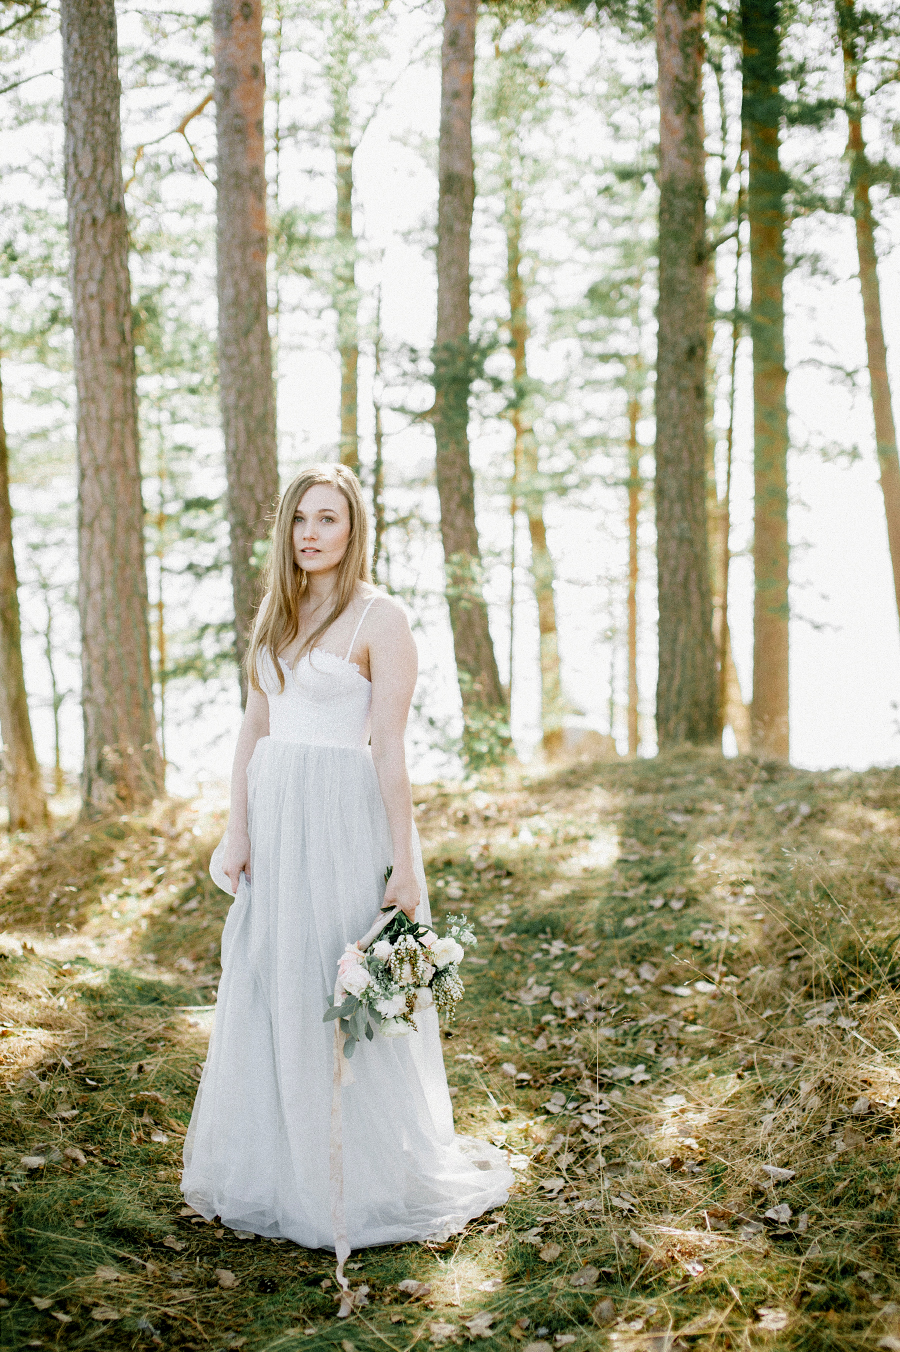 Romantic Bridal Boudoir Morsian Huomenlahja (19).jpg